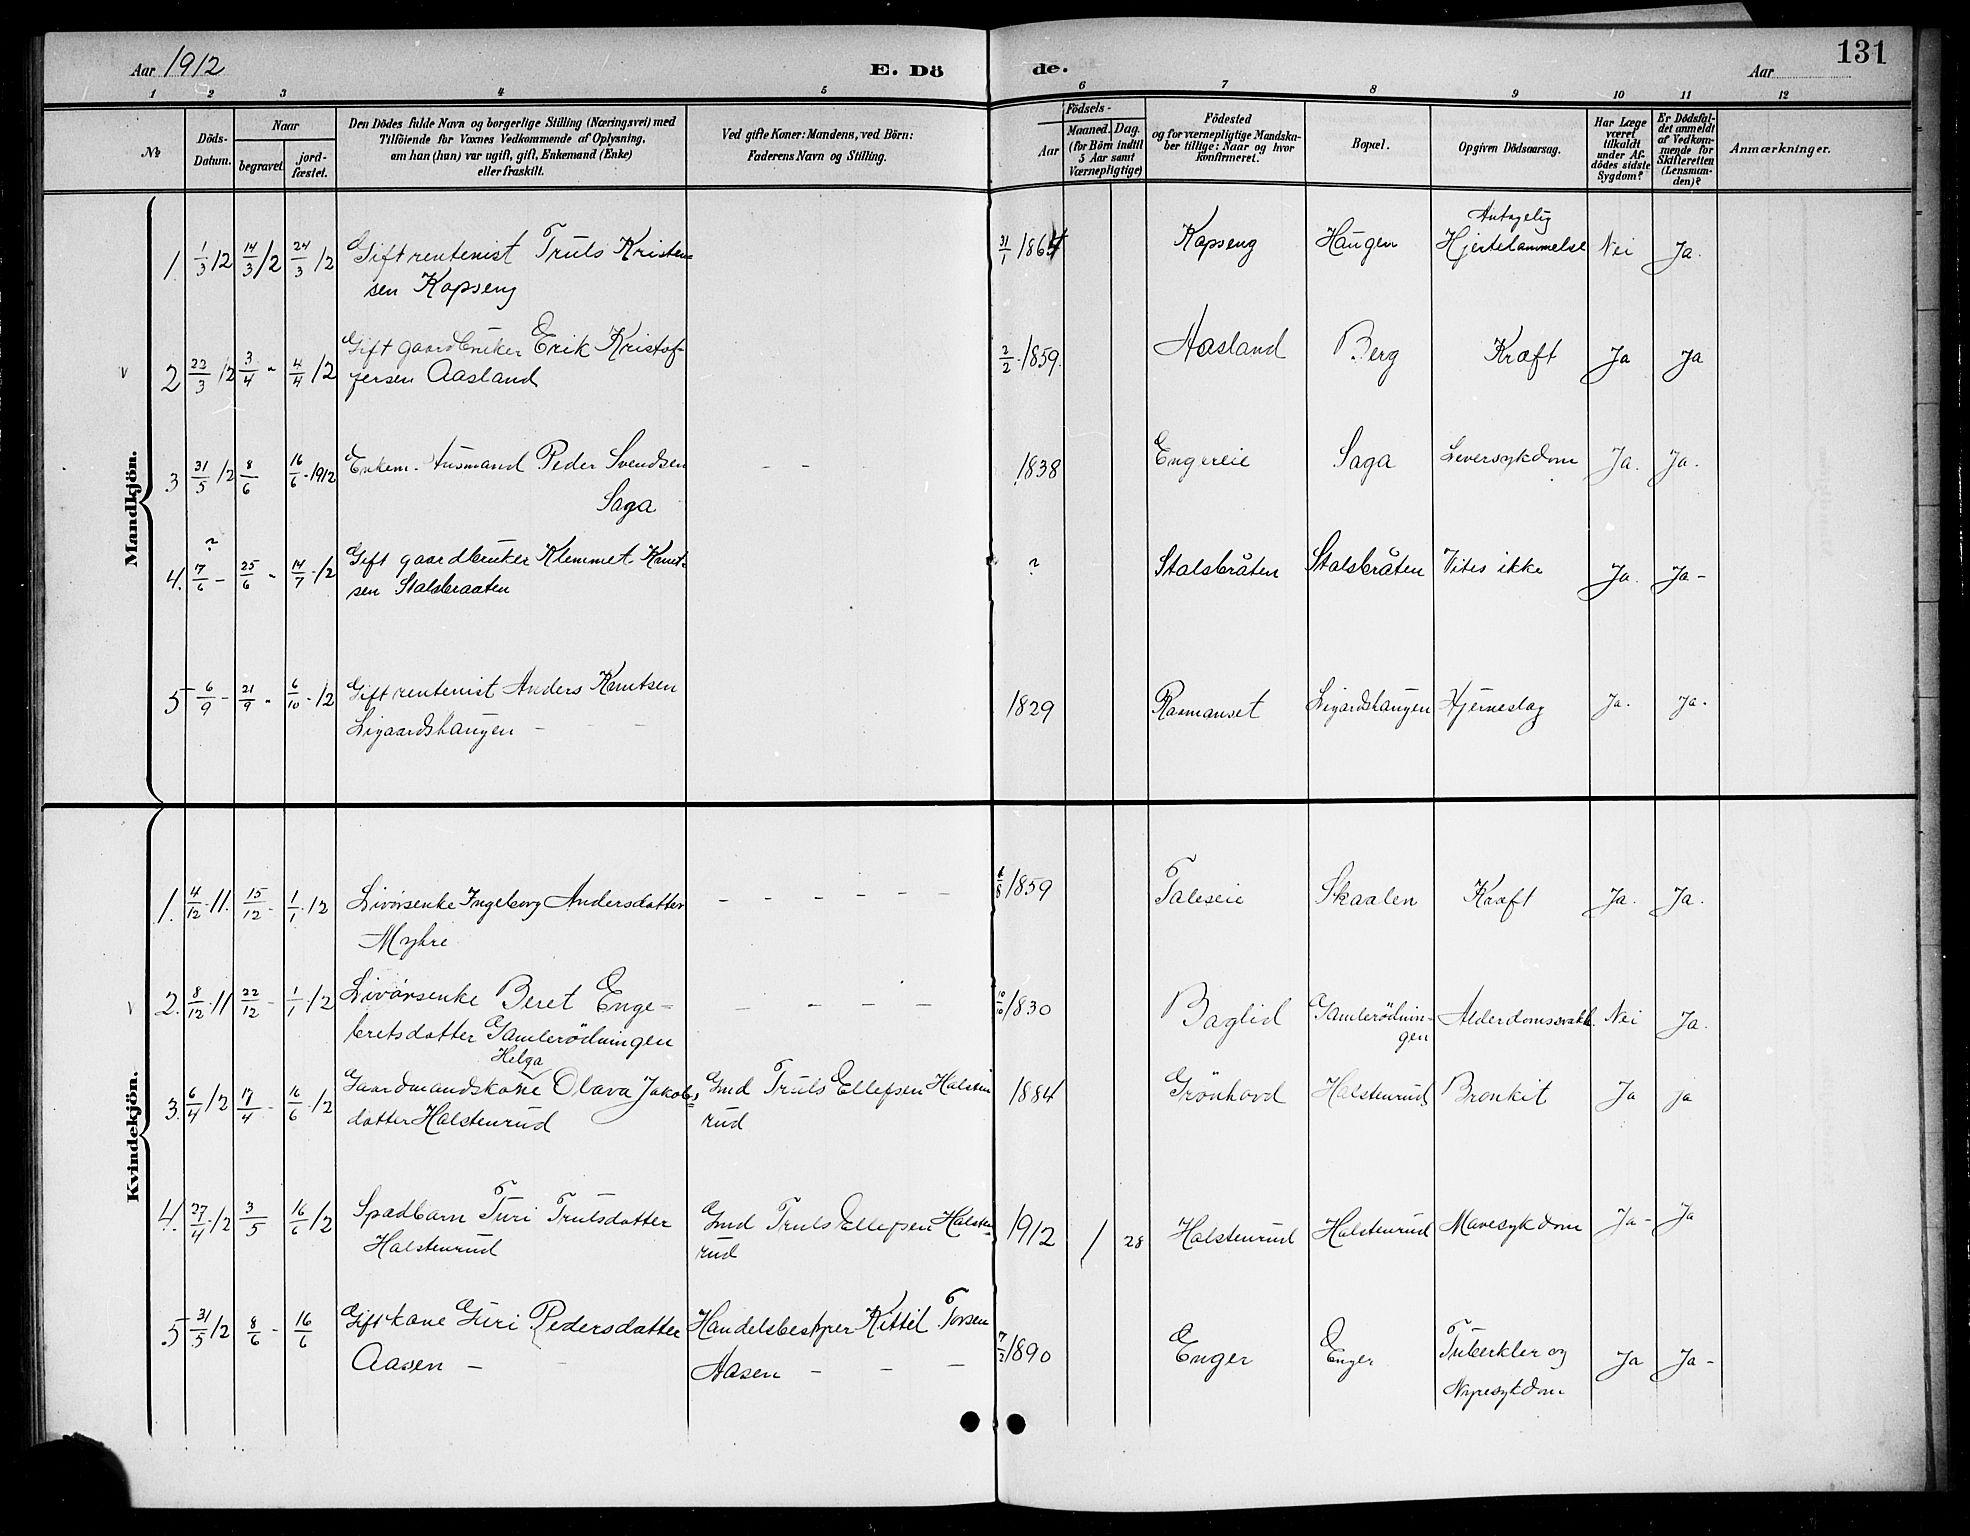 SAKO, Sigdal kirkebøker, G/Gb/L0003: Klokkerbok nr. II 3, 1901-1916, s. 131